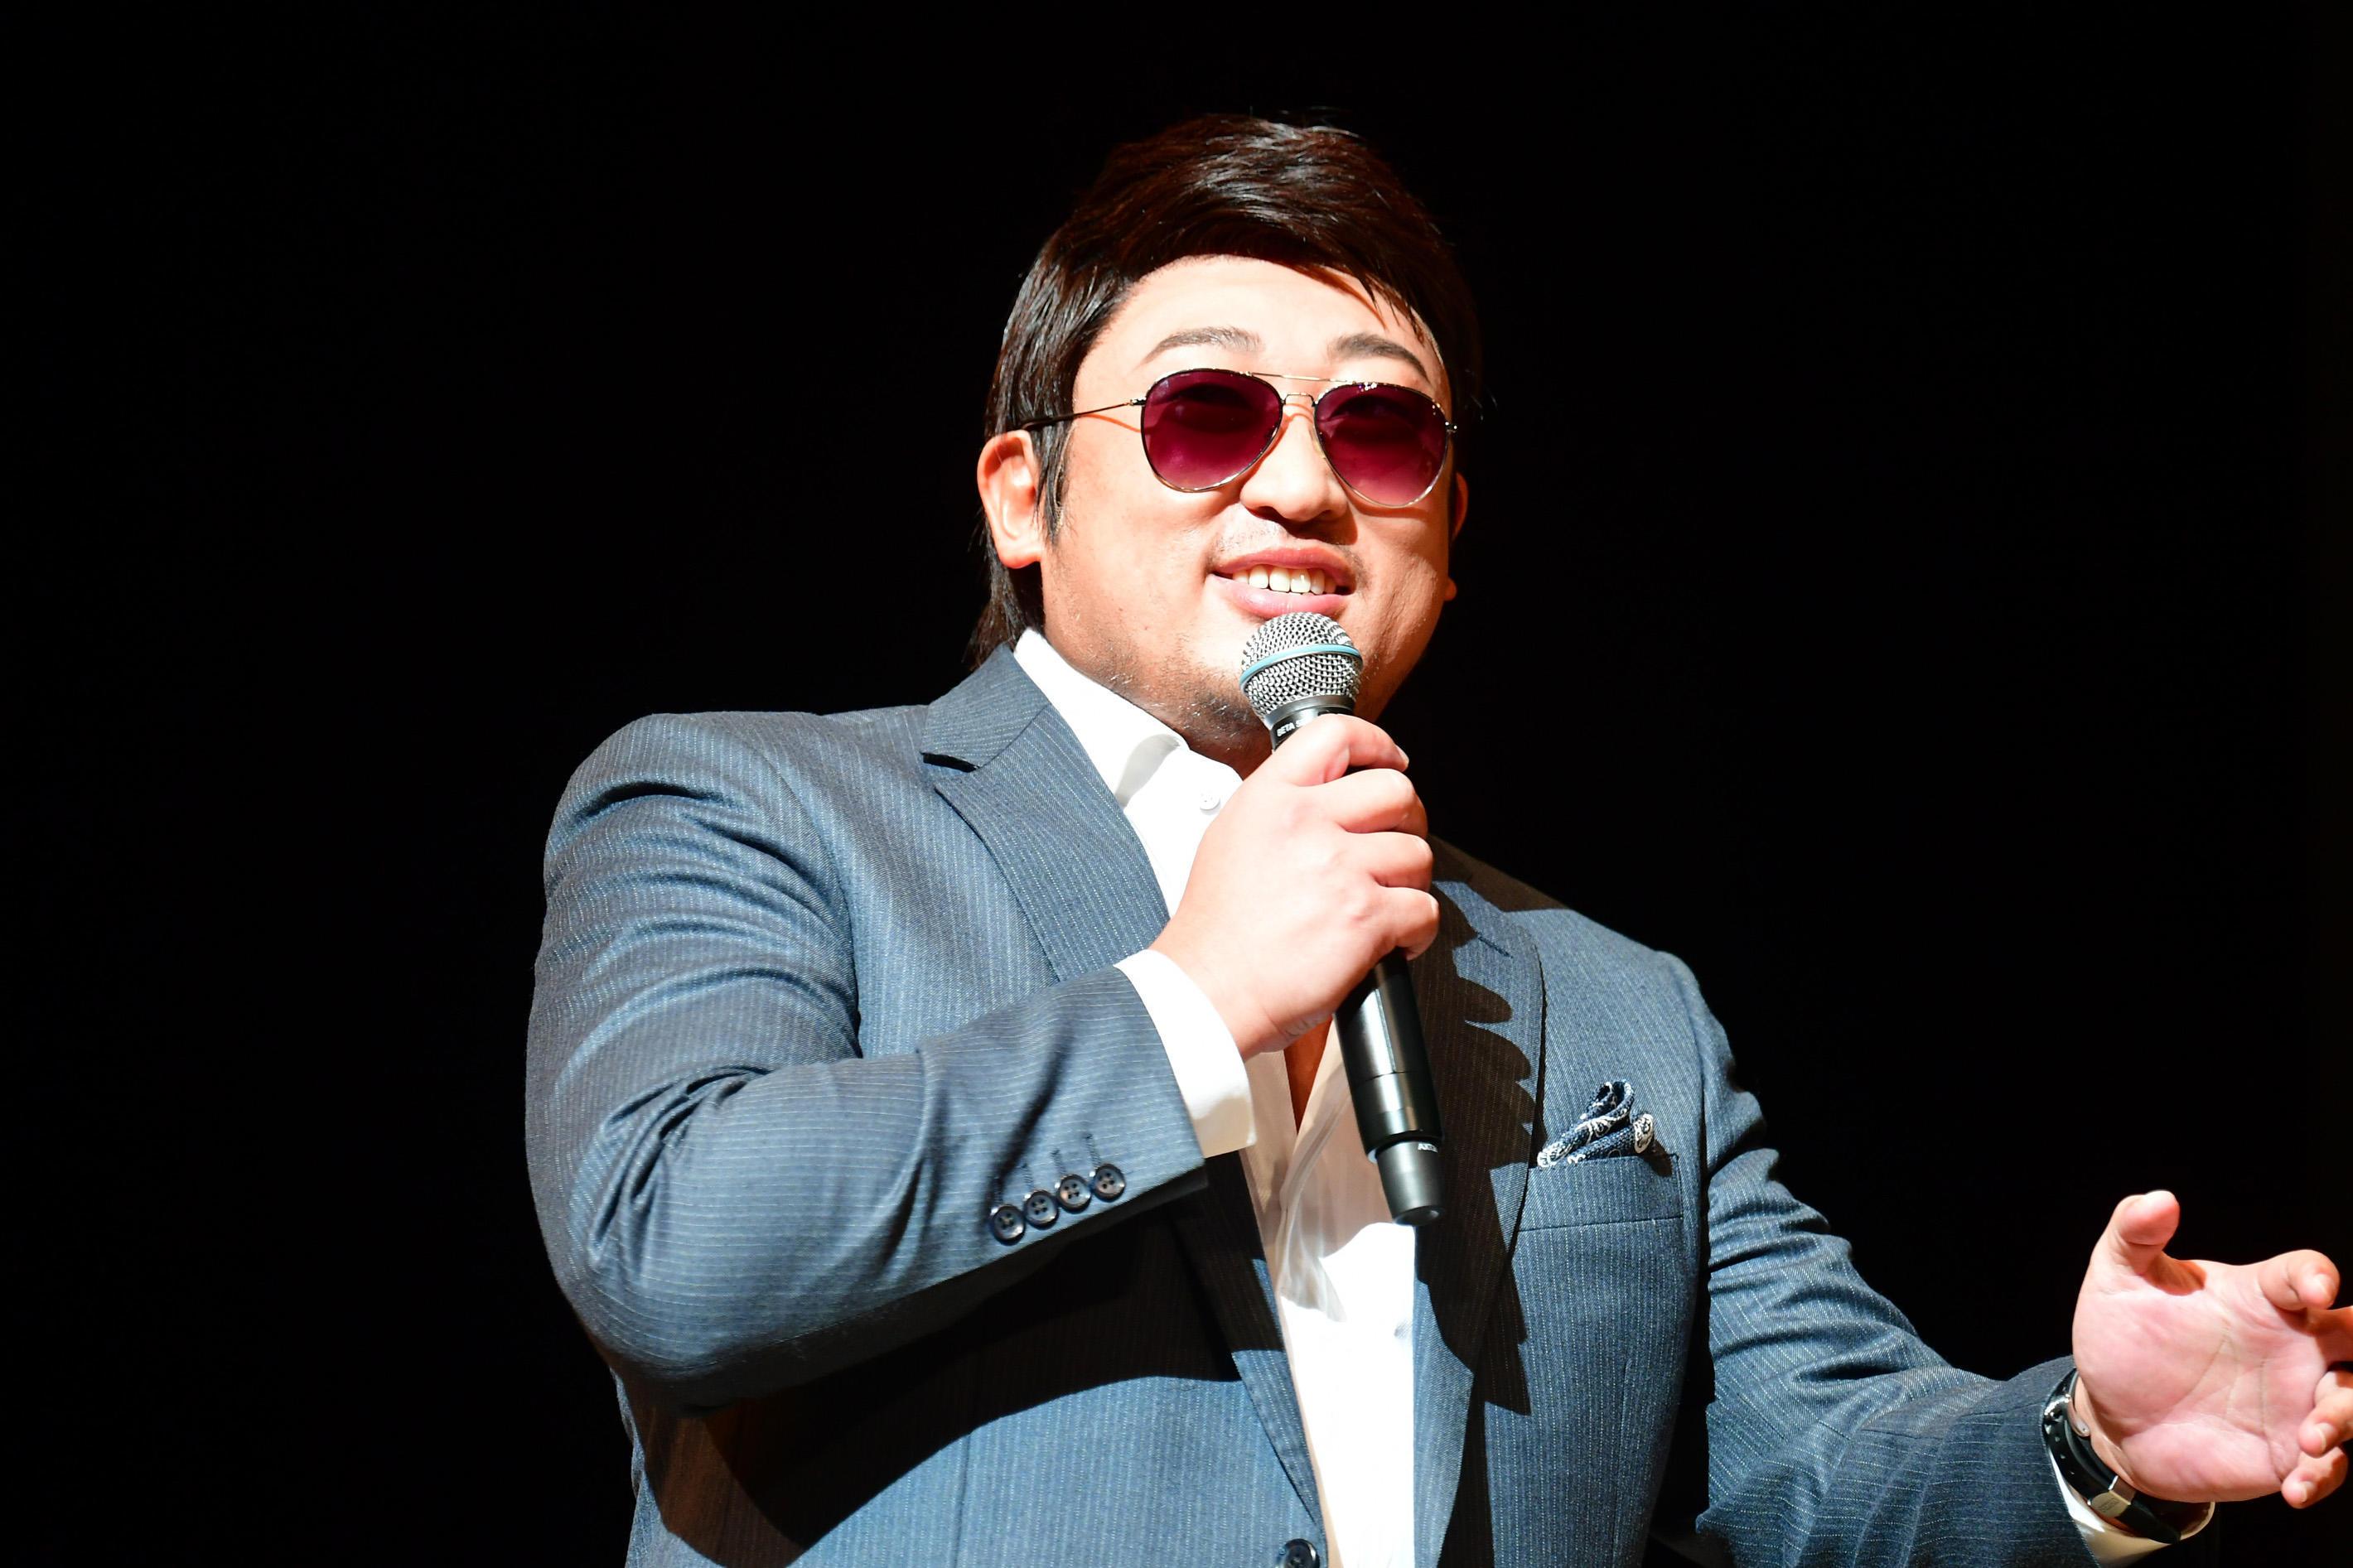 http://news.yoshimoto.co.jp/20190201193409-bc548d63ed8372abb111951de8dbc77e3179df6a.jpg